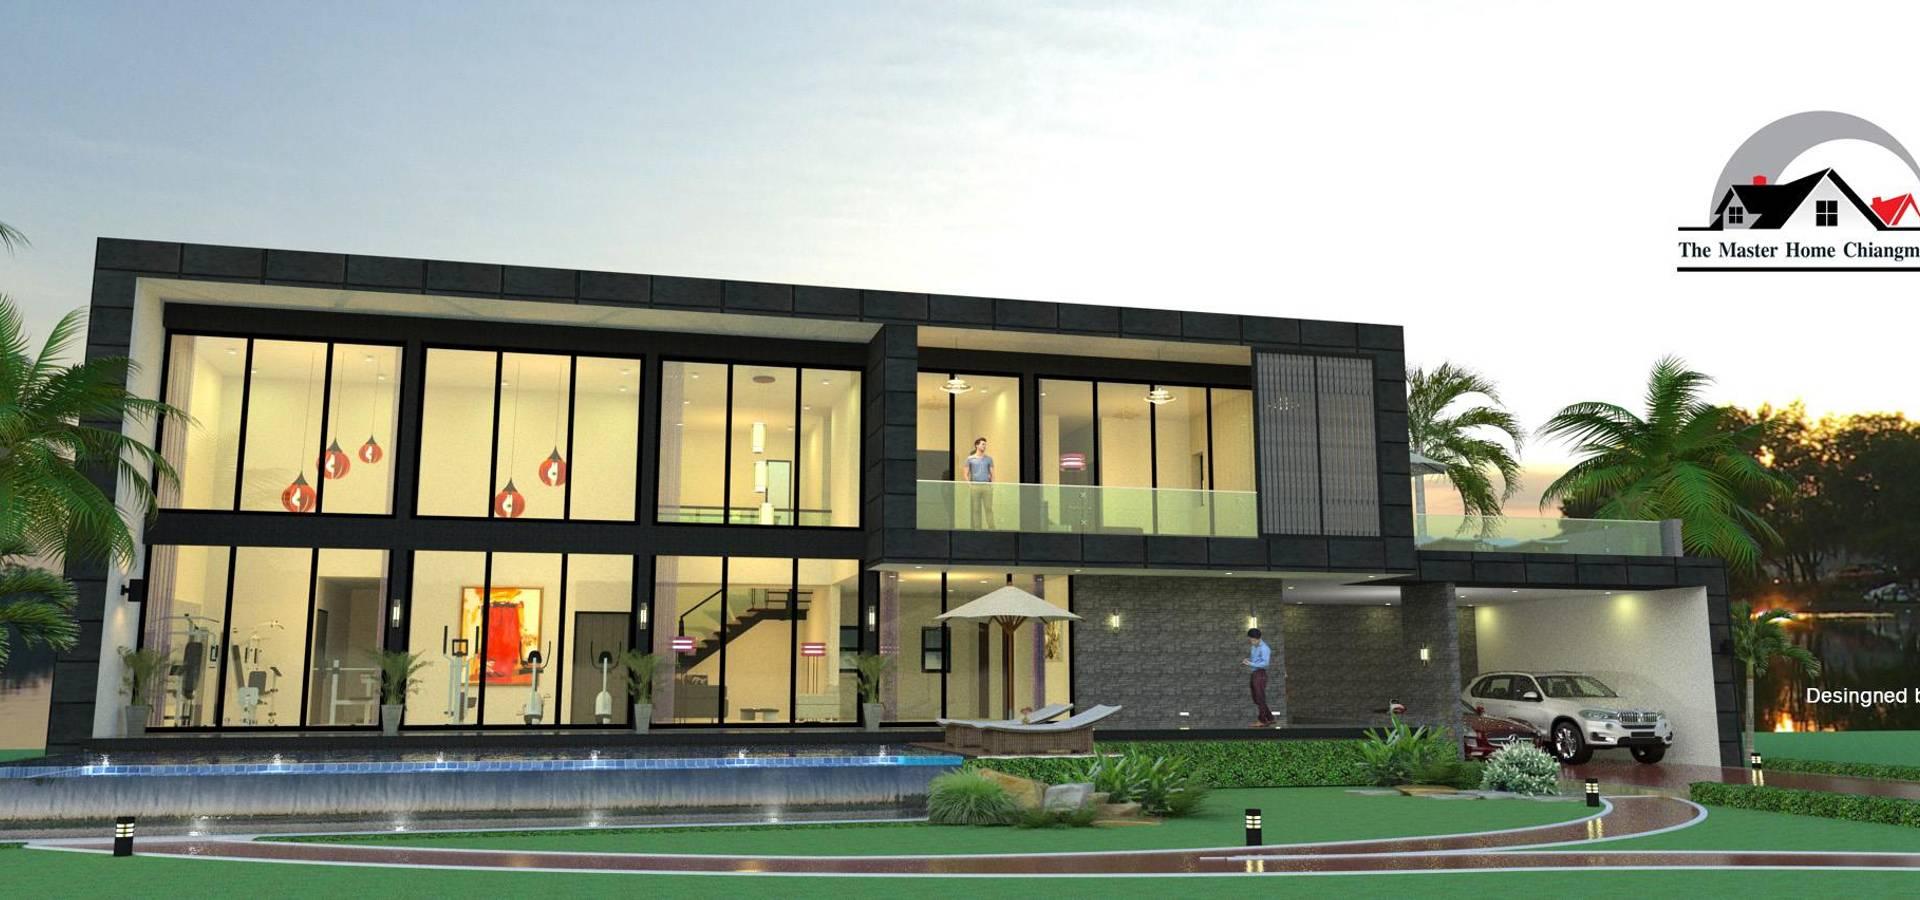 the master home chiangmai